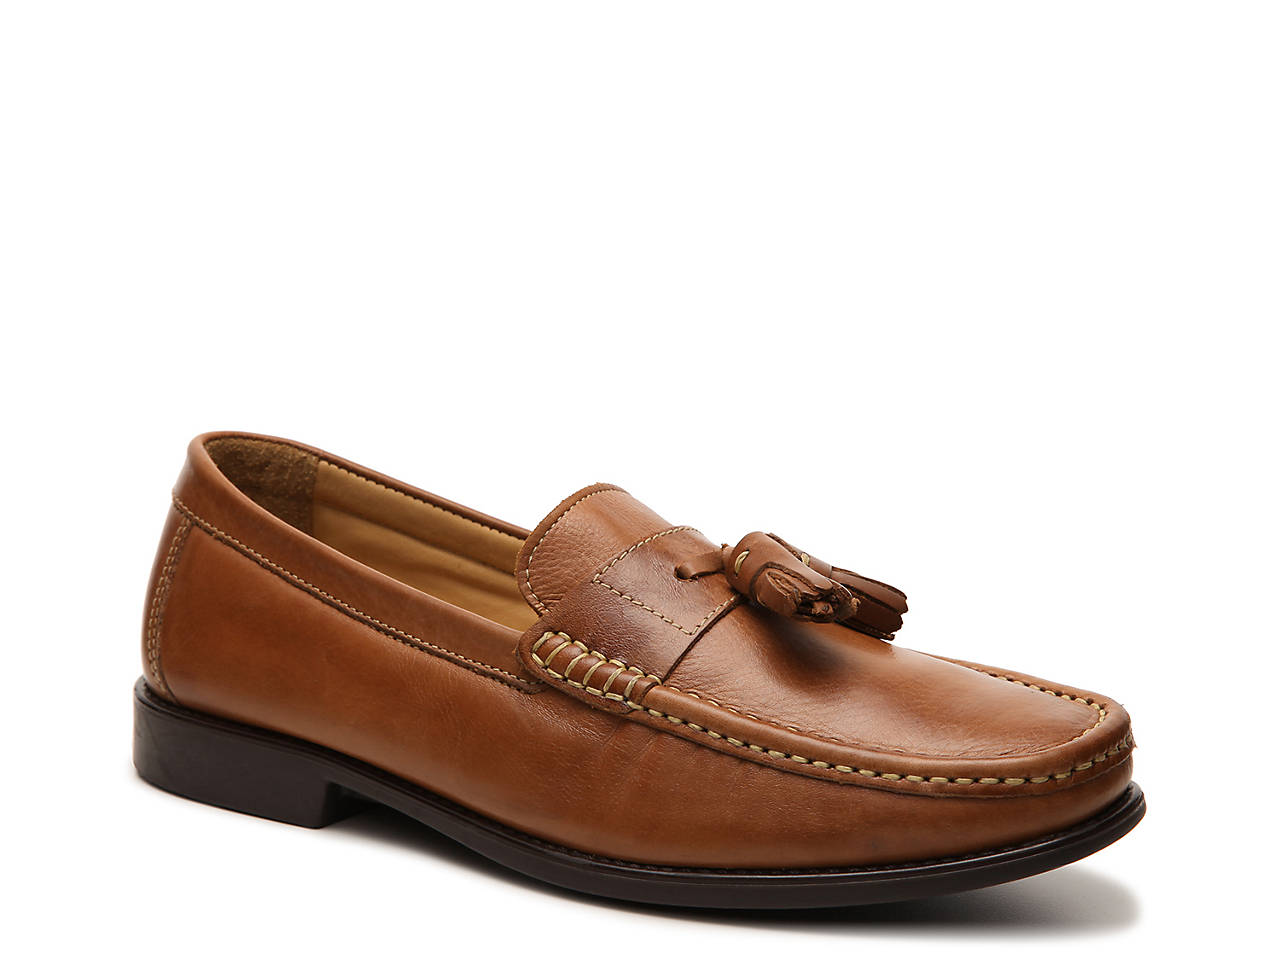 Giorgio Brutini Brown Fletch Tassel Loafer Mens